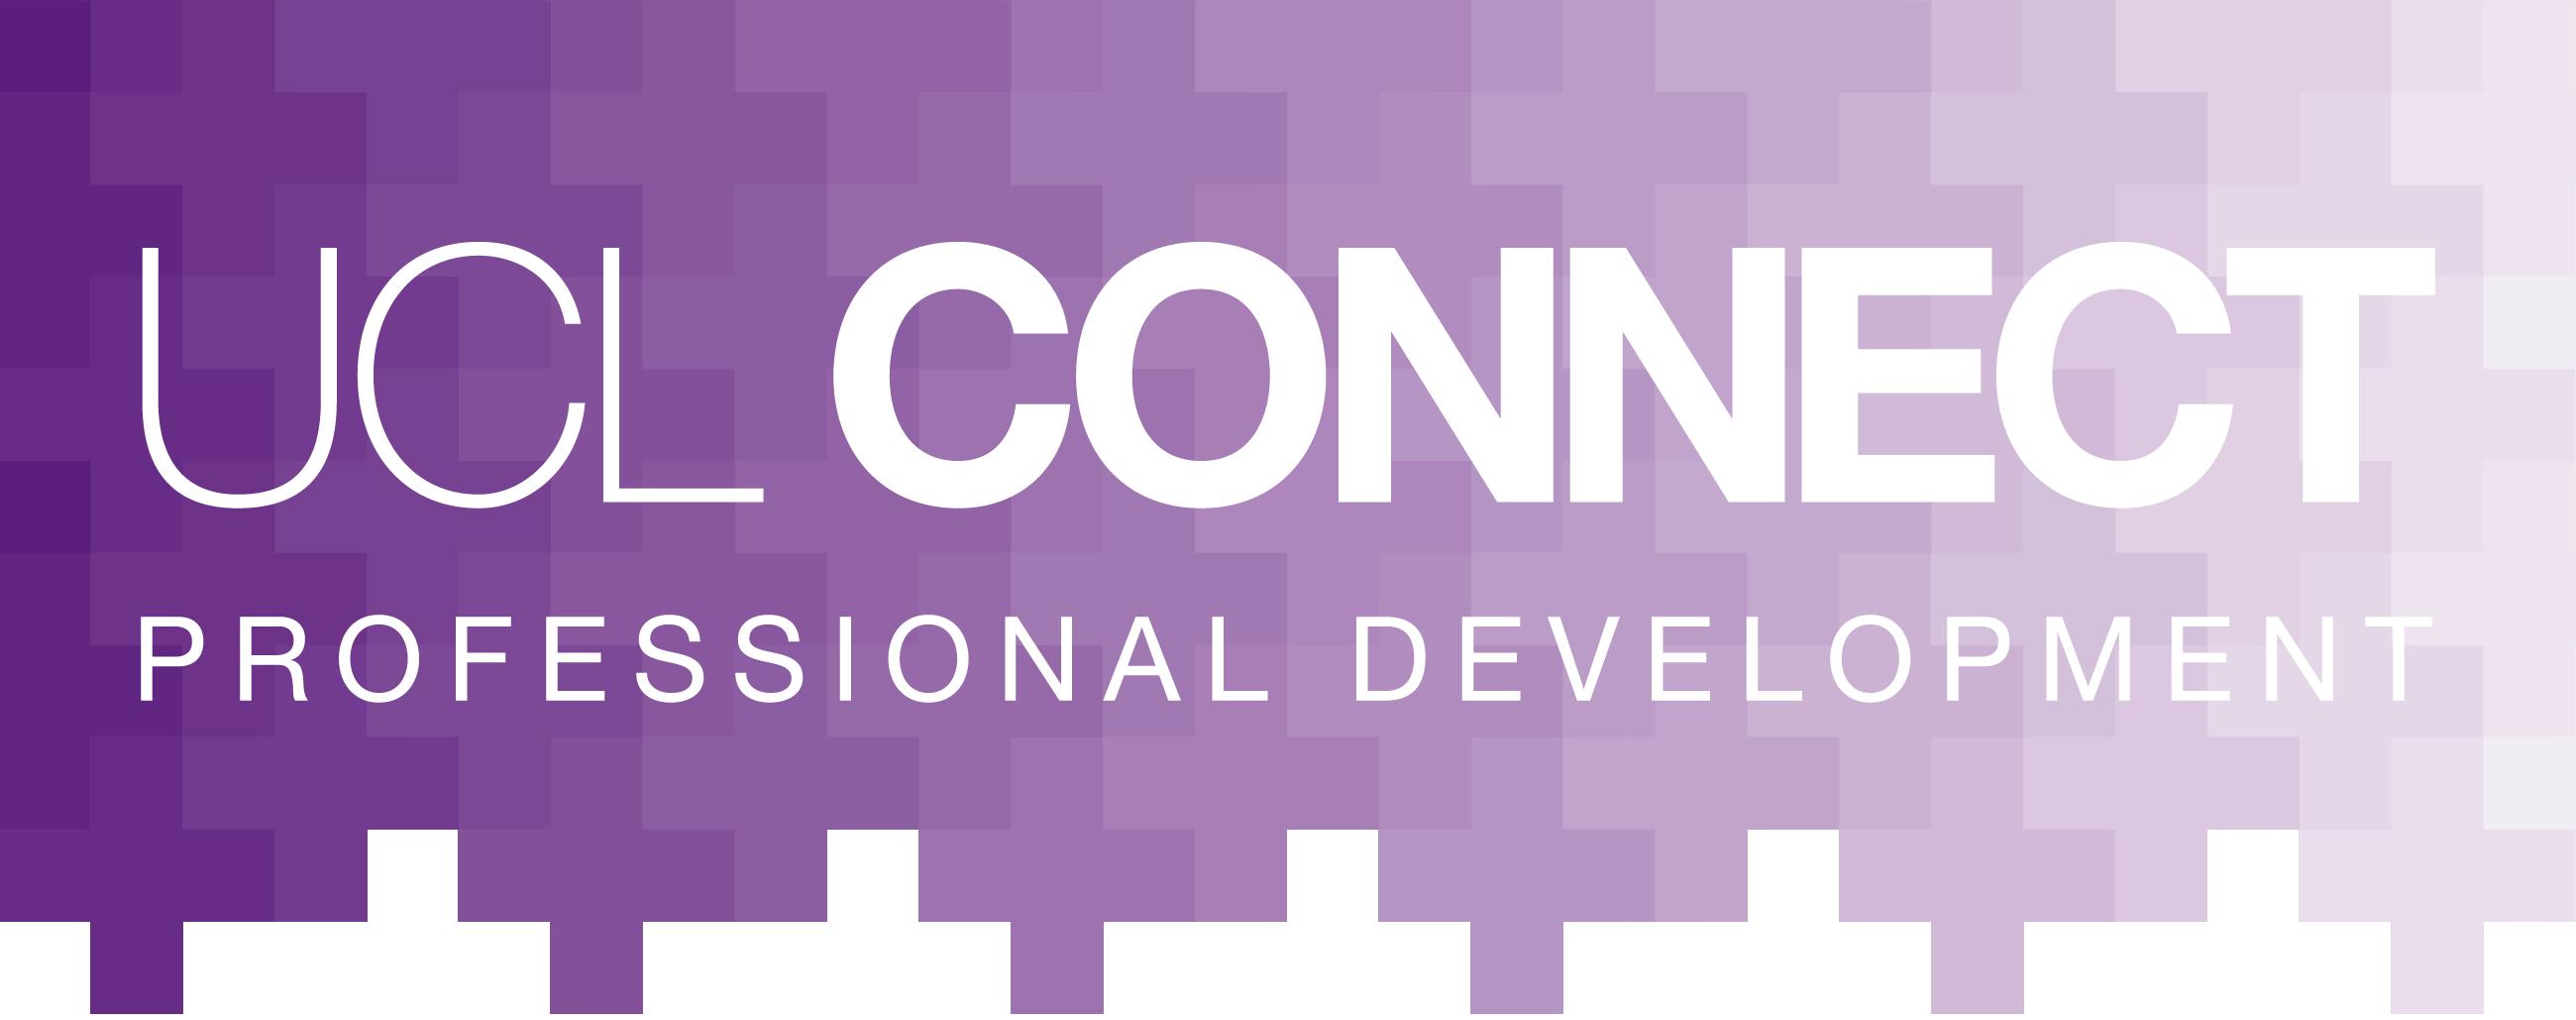 UCL Connect Logo Purple